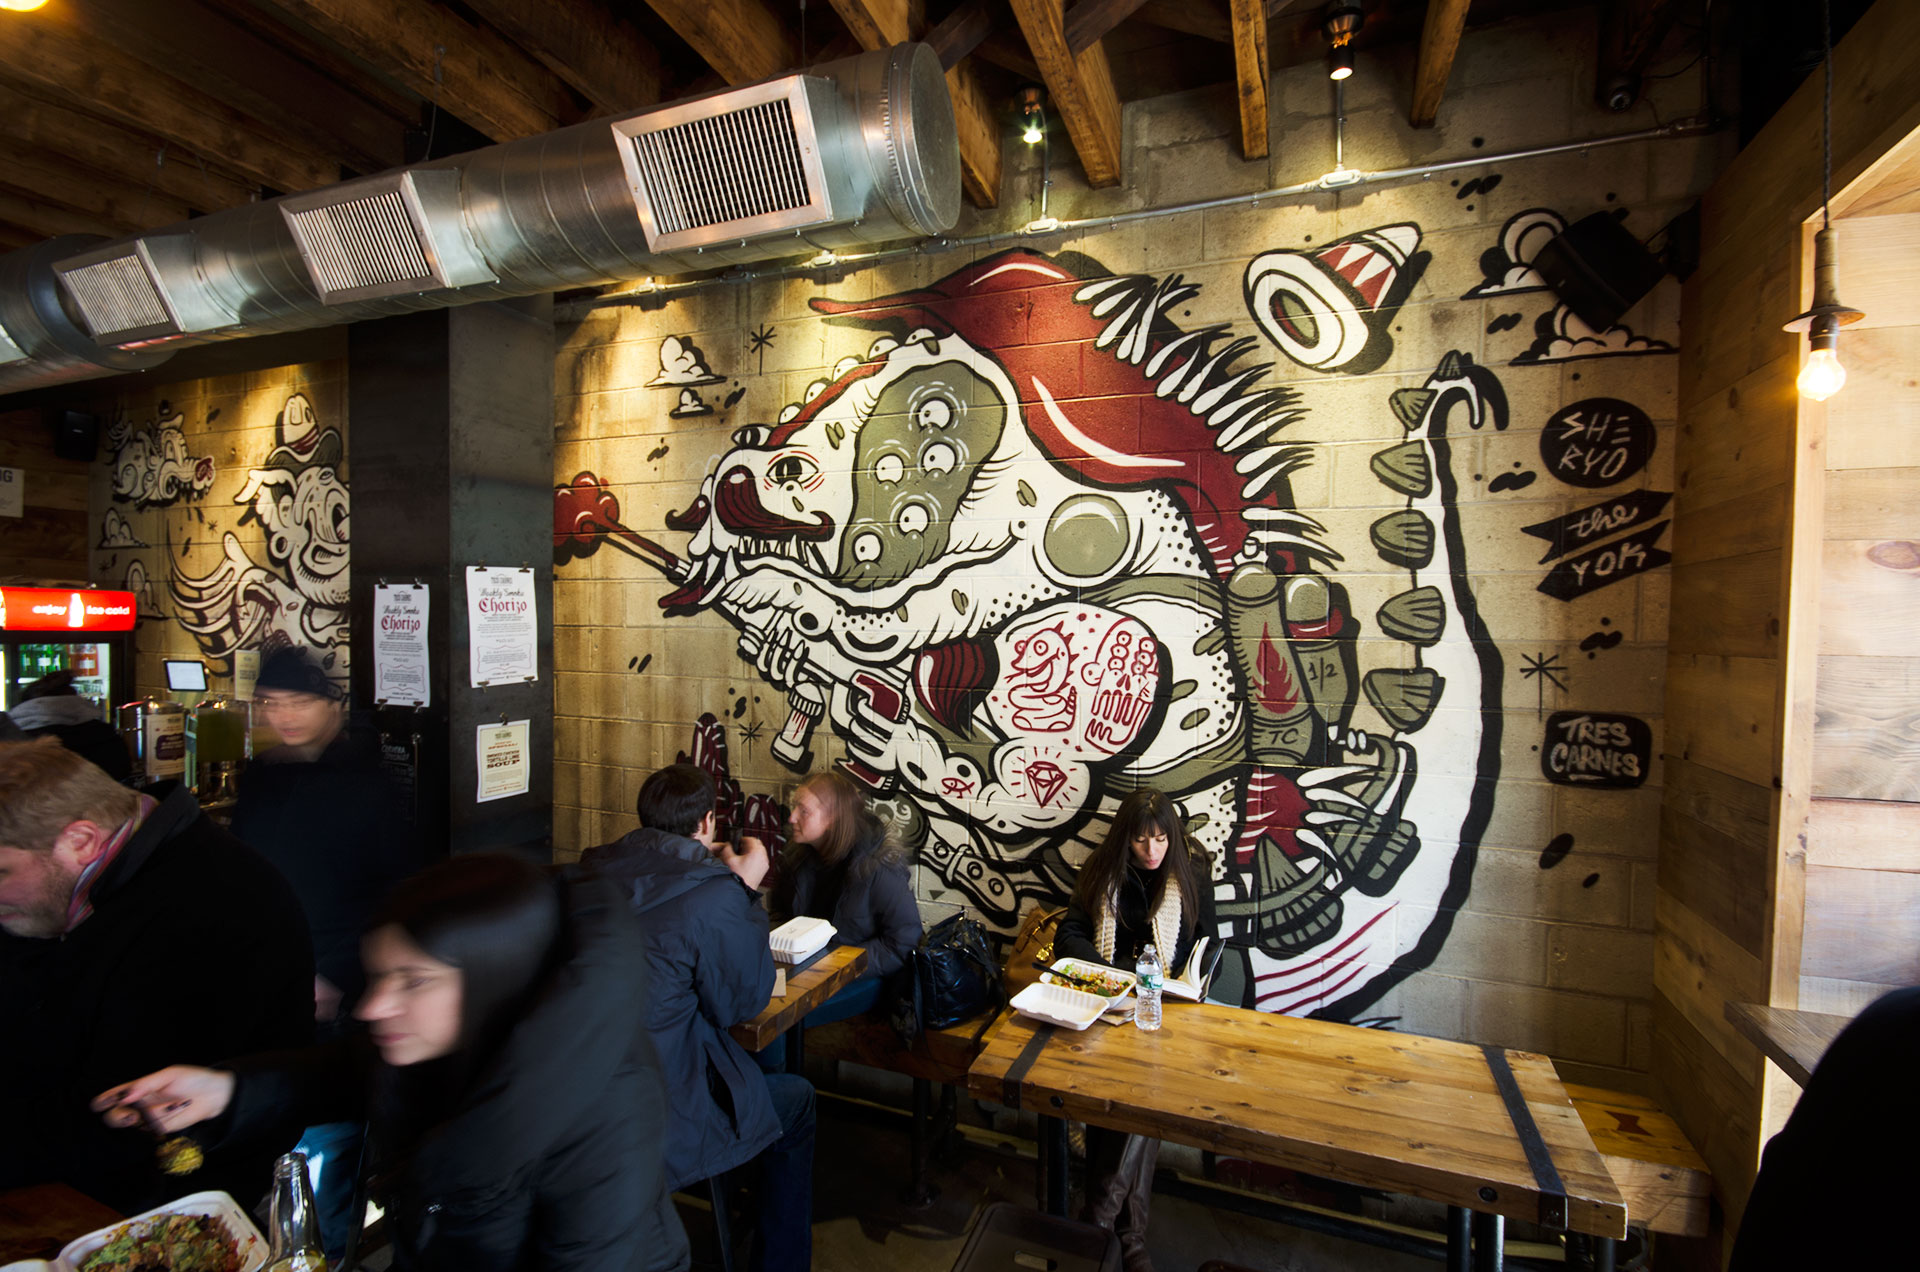 Mural: Sheryo & The Yok